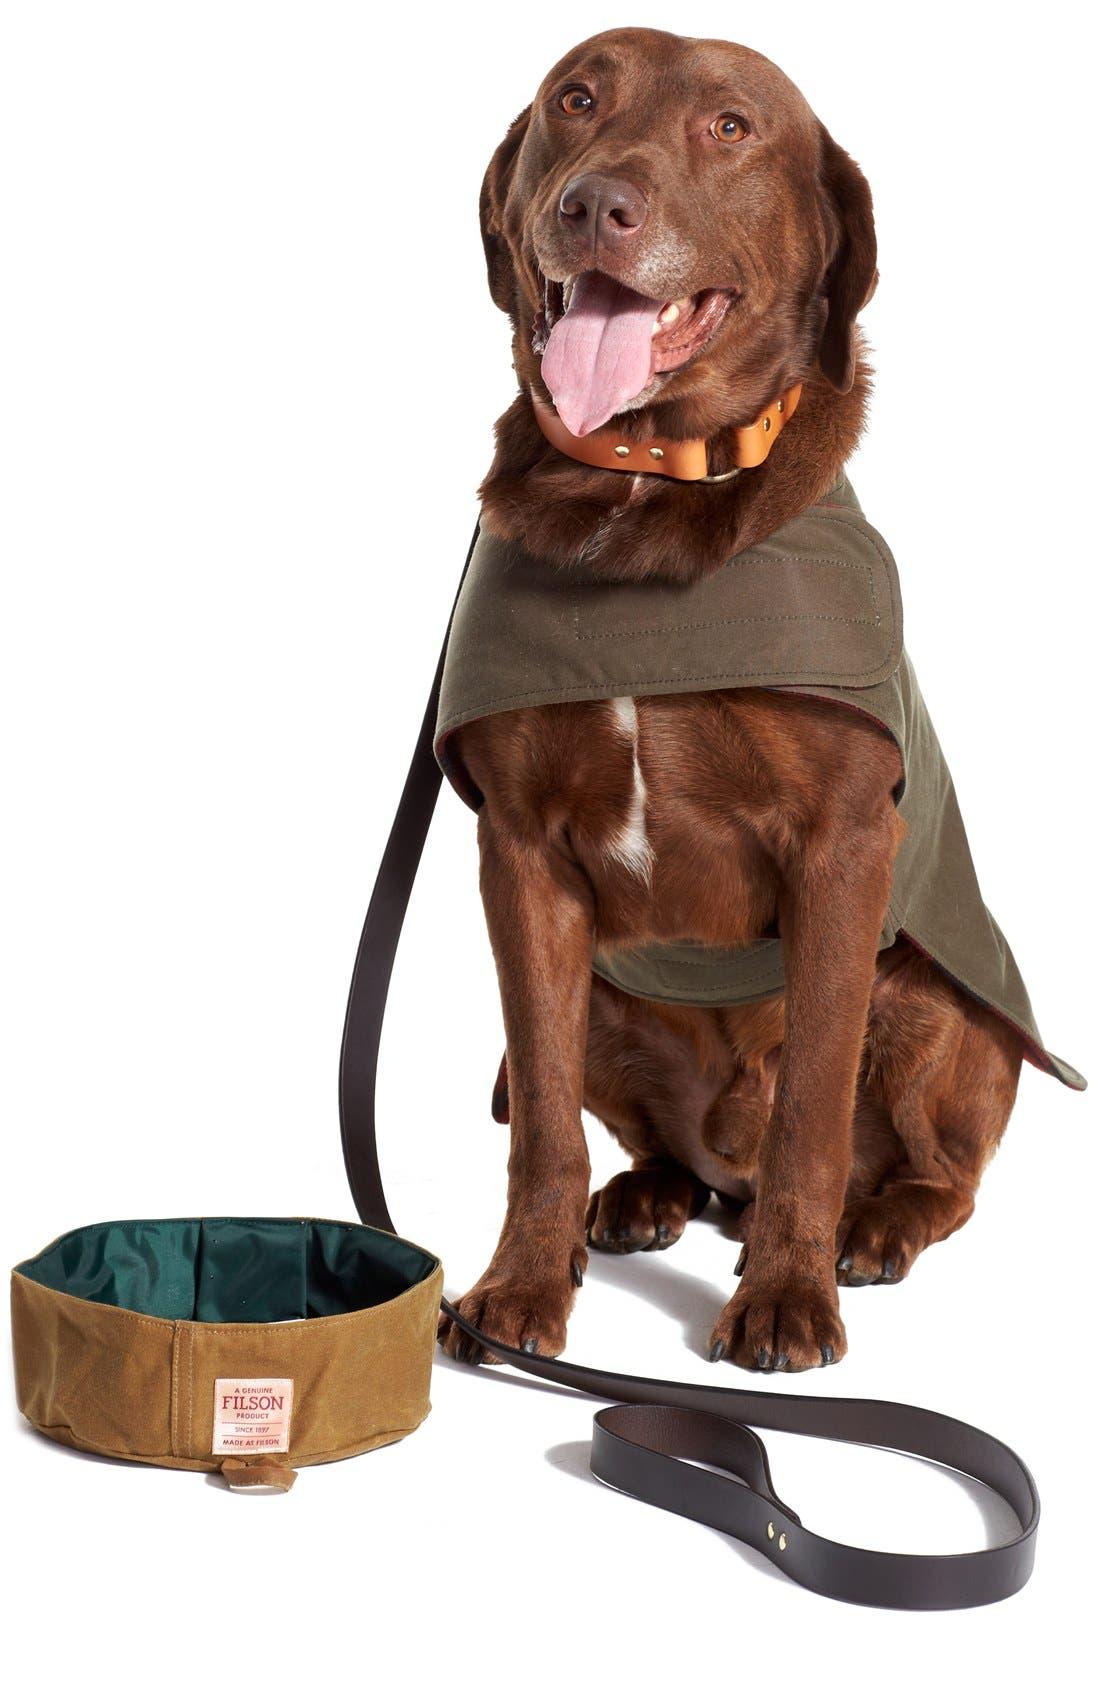 FILSON,                             Collapsible Dog Bowl,                             Alternate thumbnail 2, color,                             260